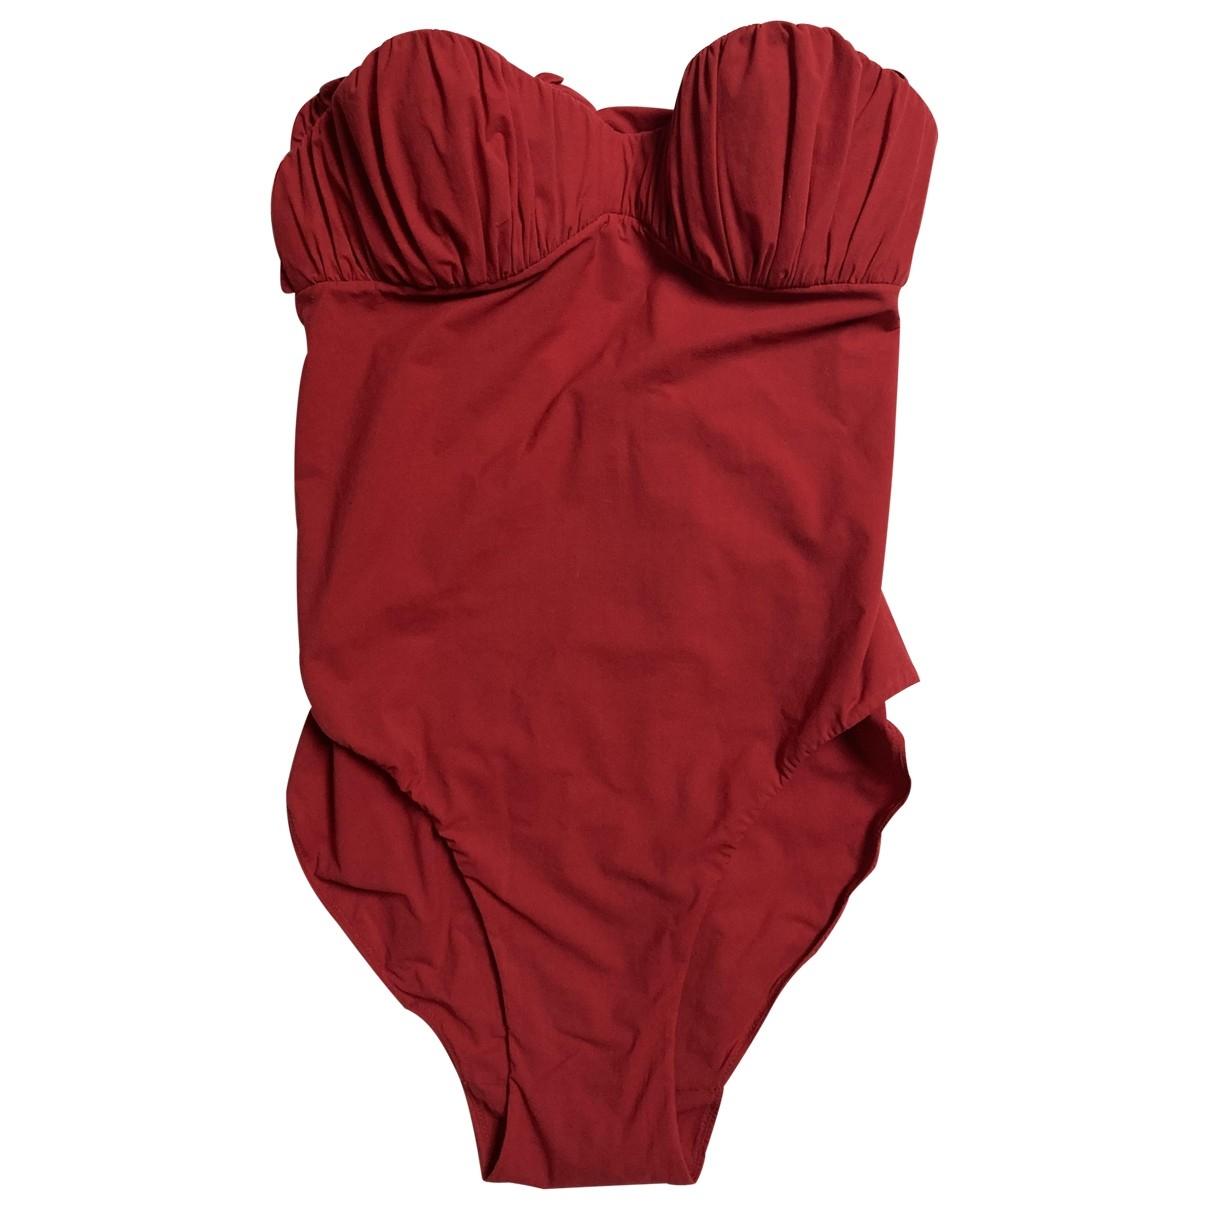 Carine Gilson \N Red Cotton - elasthane Swimwear for Women 36 FR